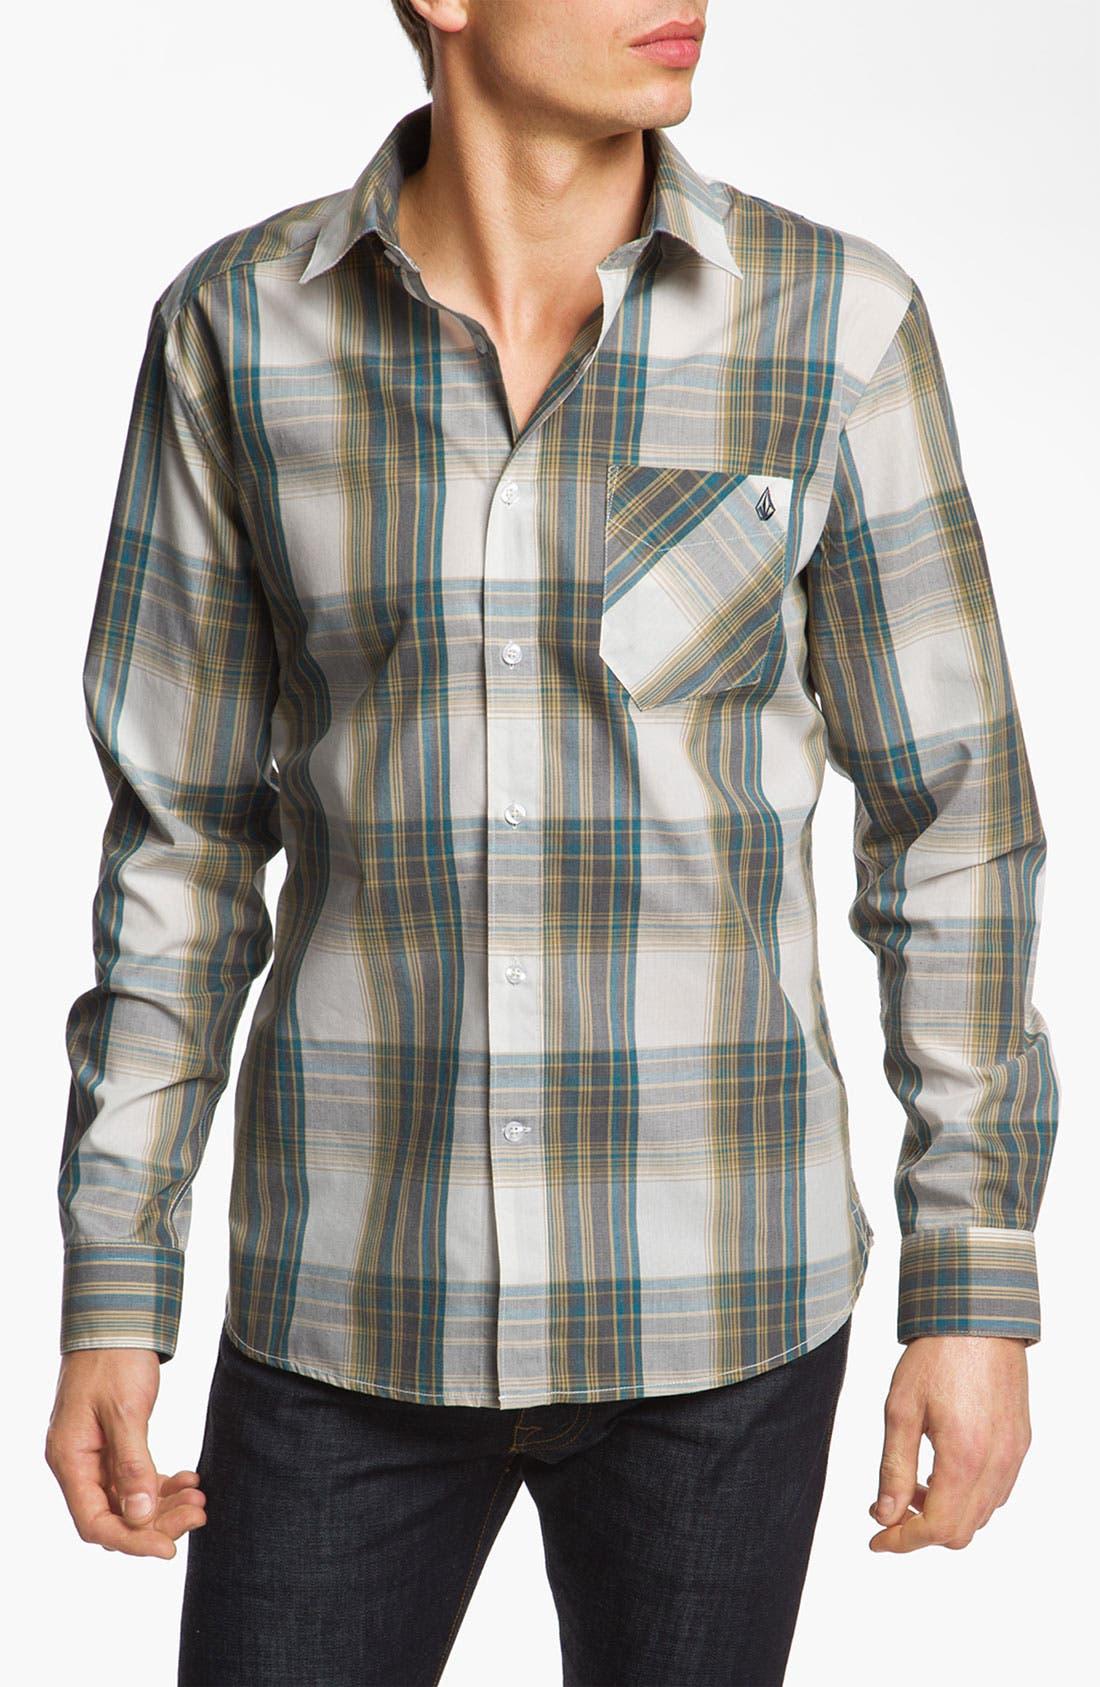 Alternate Image 1 Selected - Volcom 'Ex-Factor' Plaid Woven Shirt